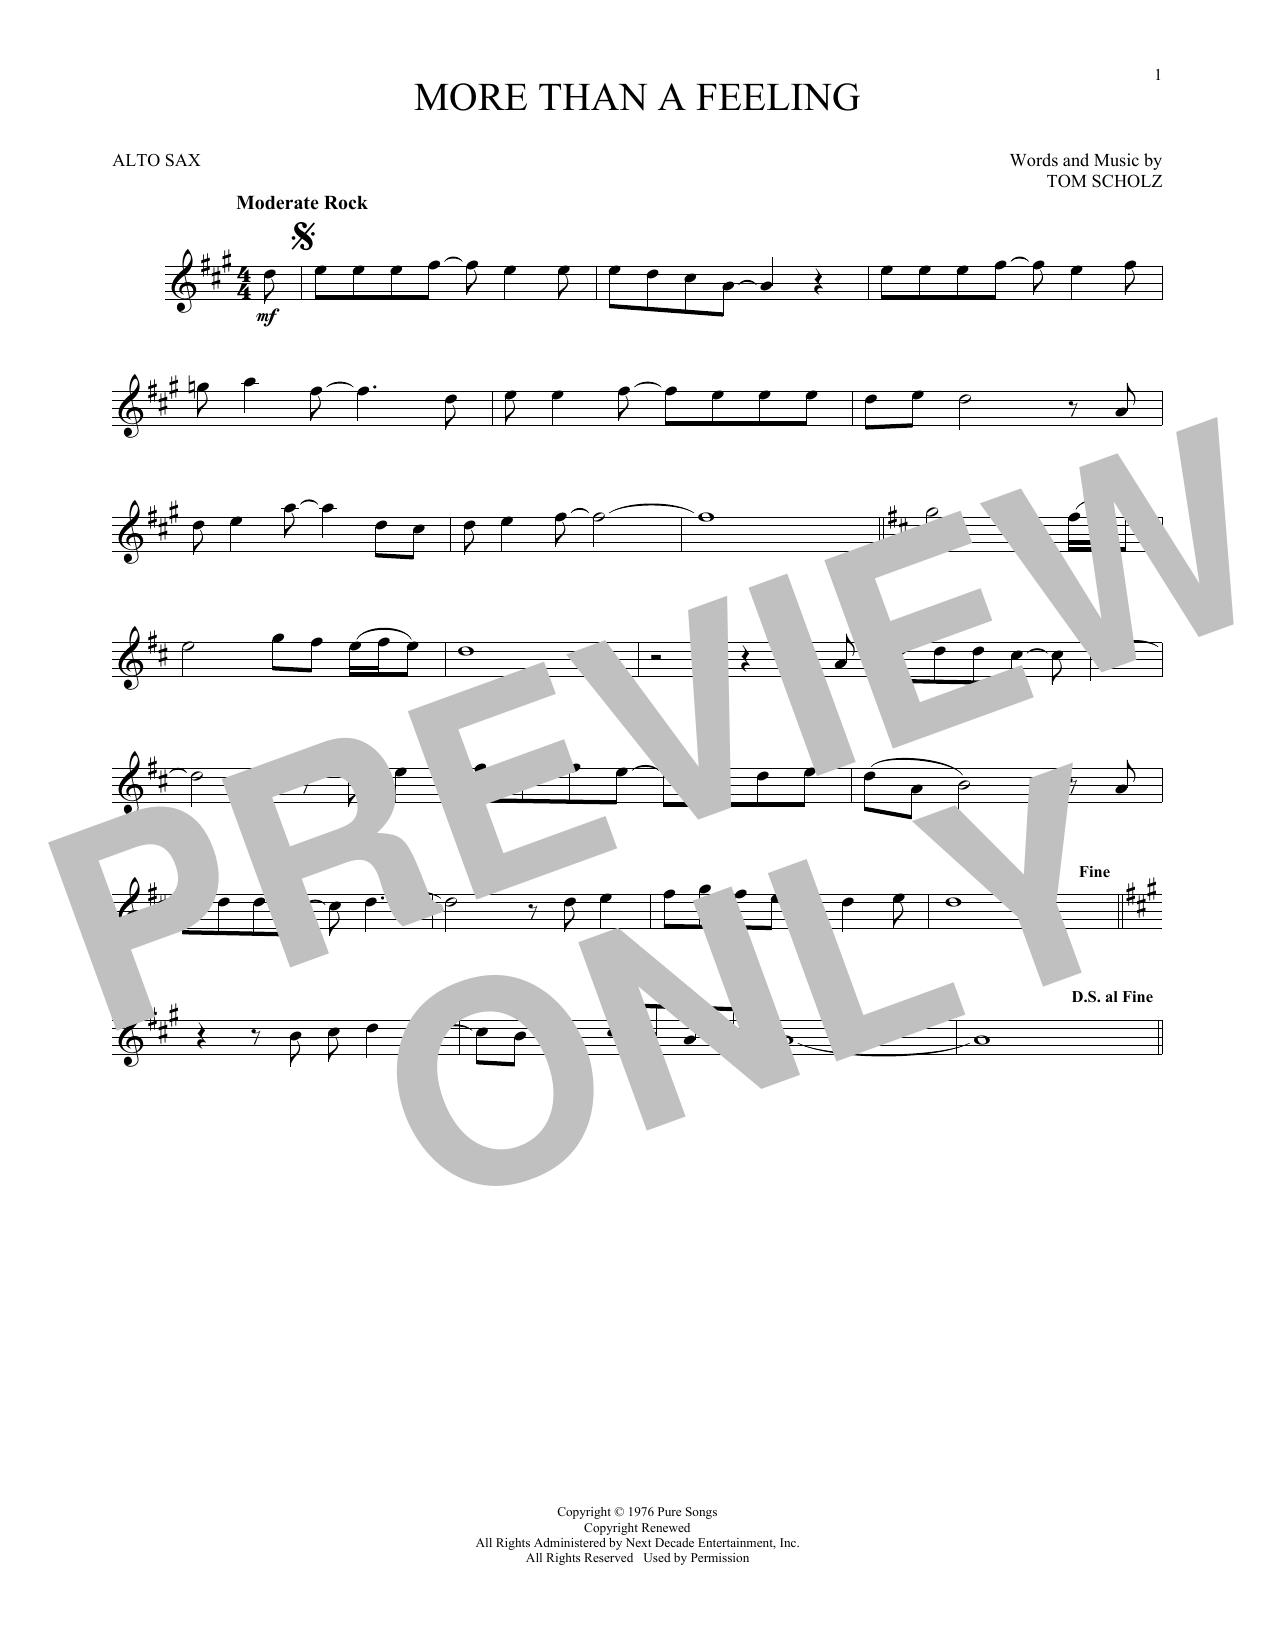 More Than A Feeling (Alto Sax Solo)